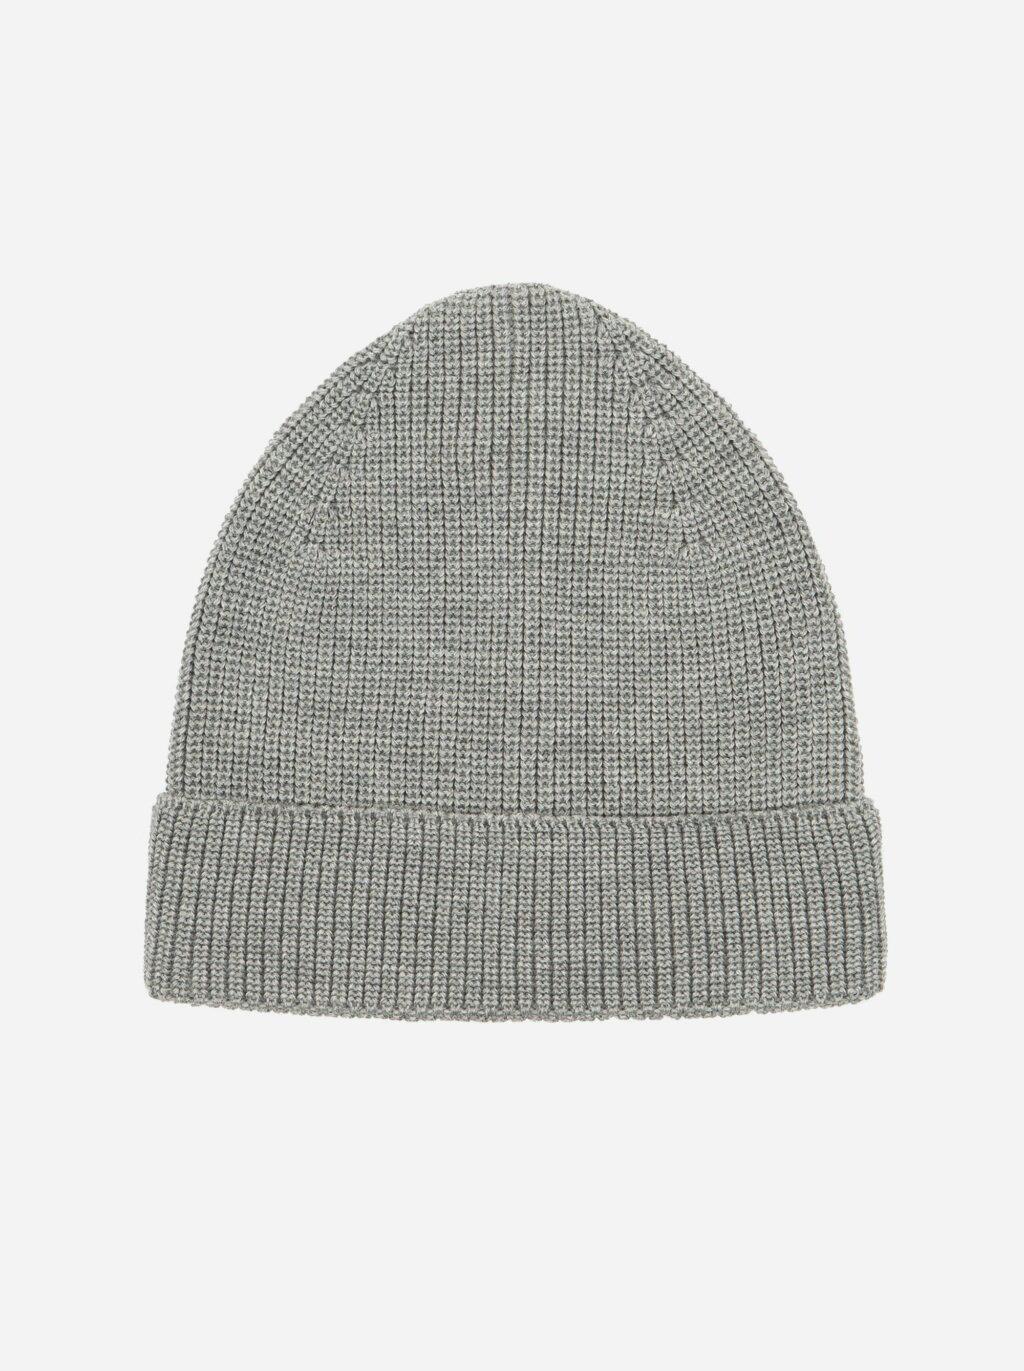 Teym-The-Beanie-Grey-1024x1371